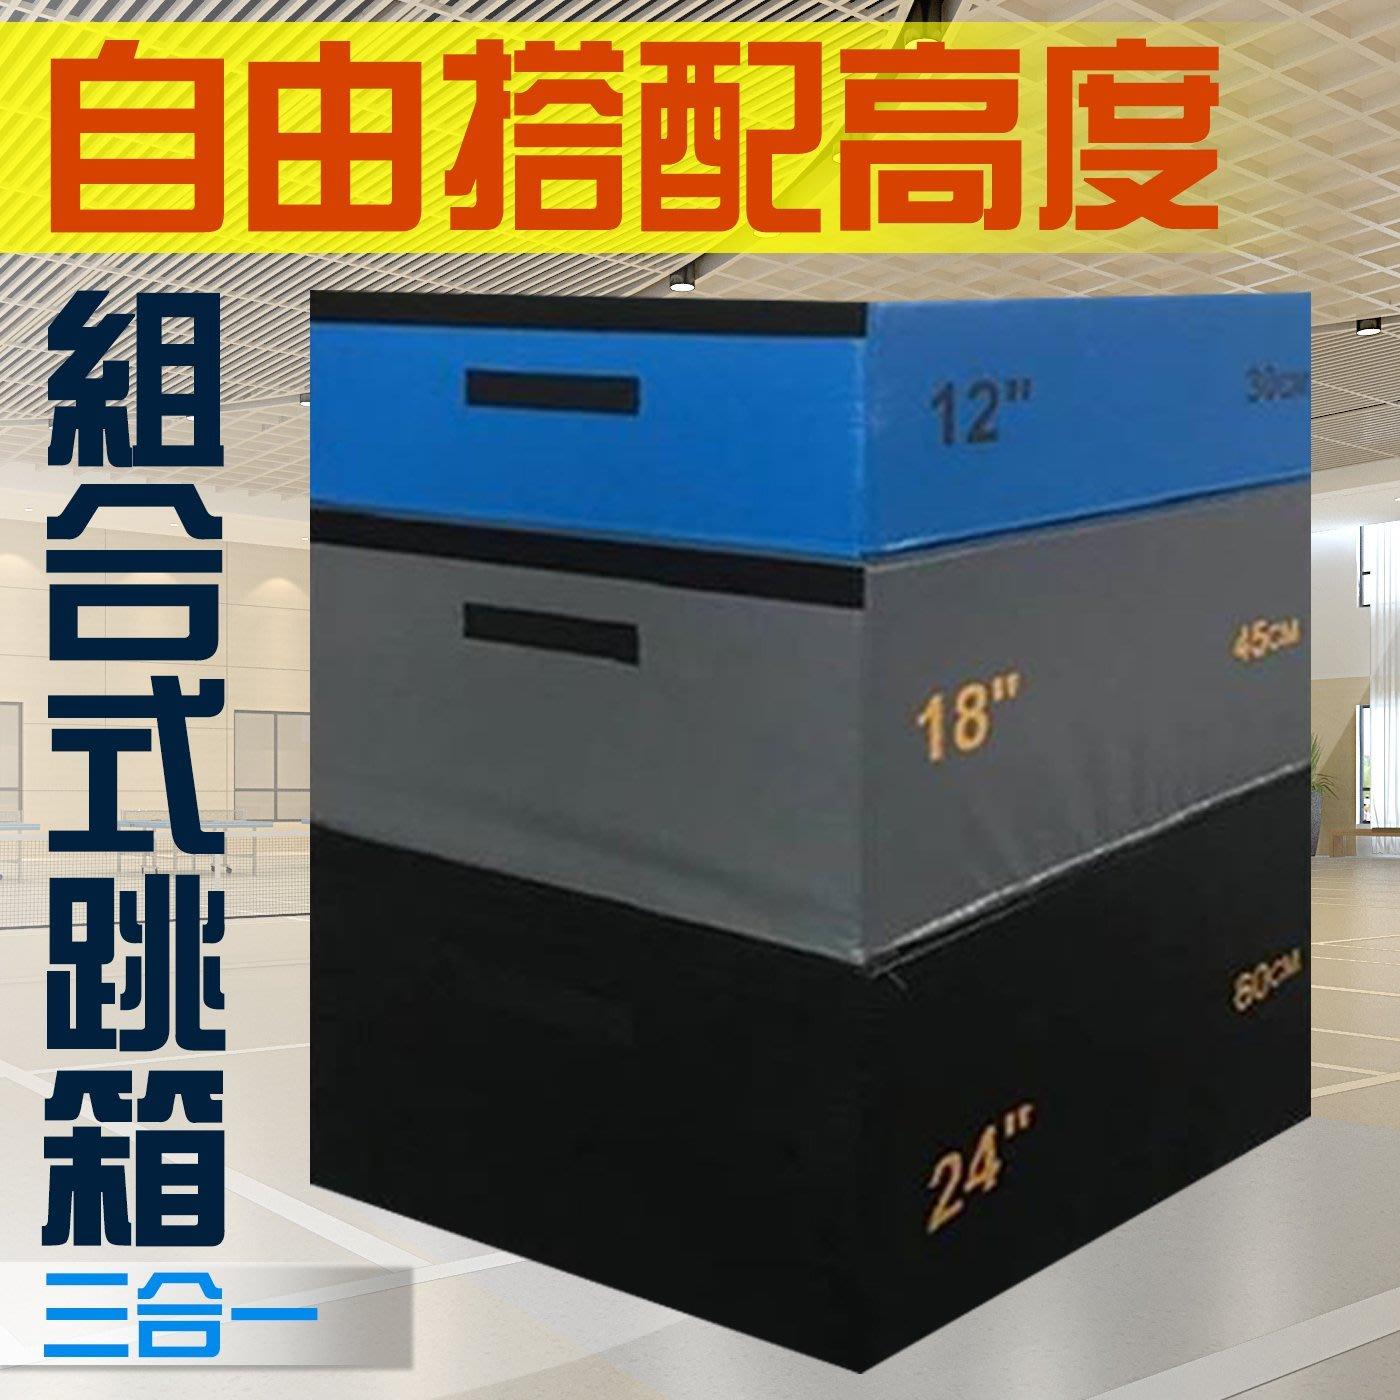 【Fitek健身網】現貨-專業漸進式跳箱、三合一體能訓練綜合跳箱、三入軟跳箱跳凳、安全跳箱、一組有3種不同高度的跳箱